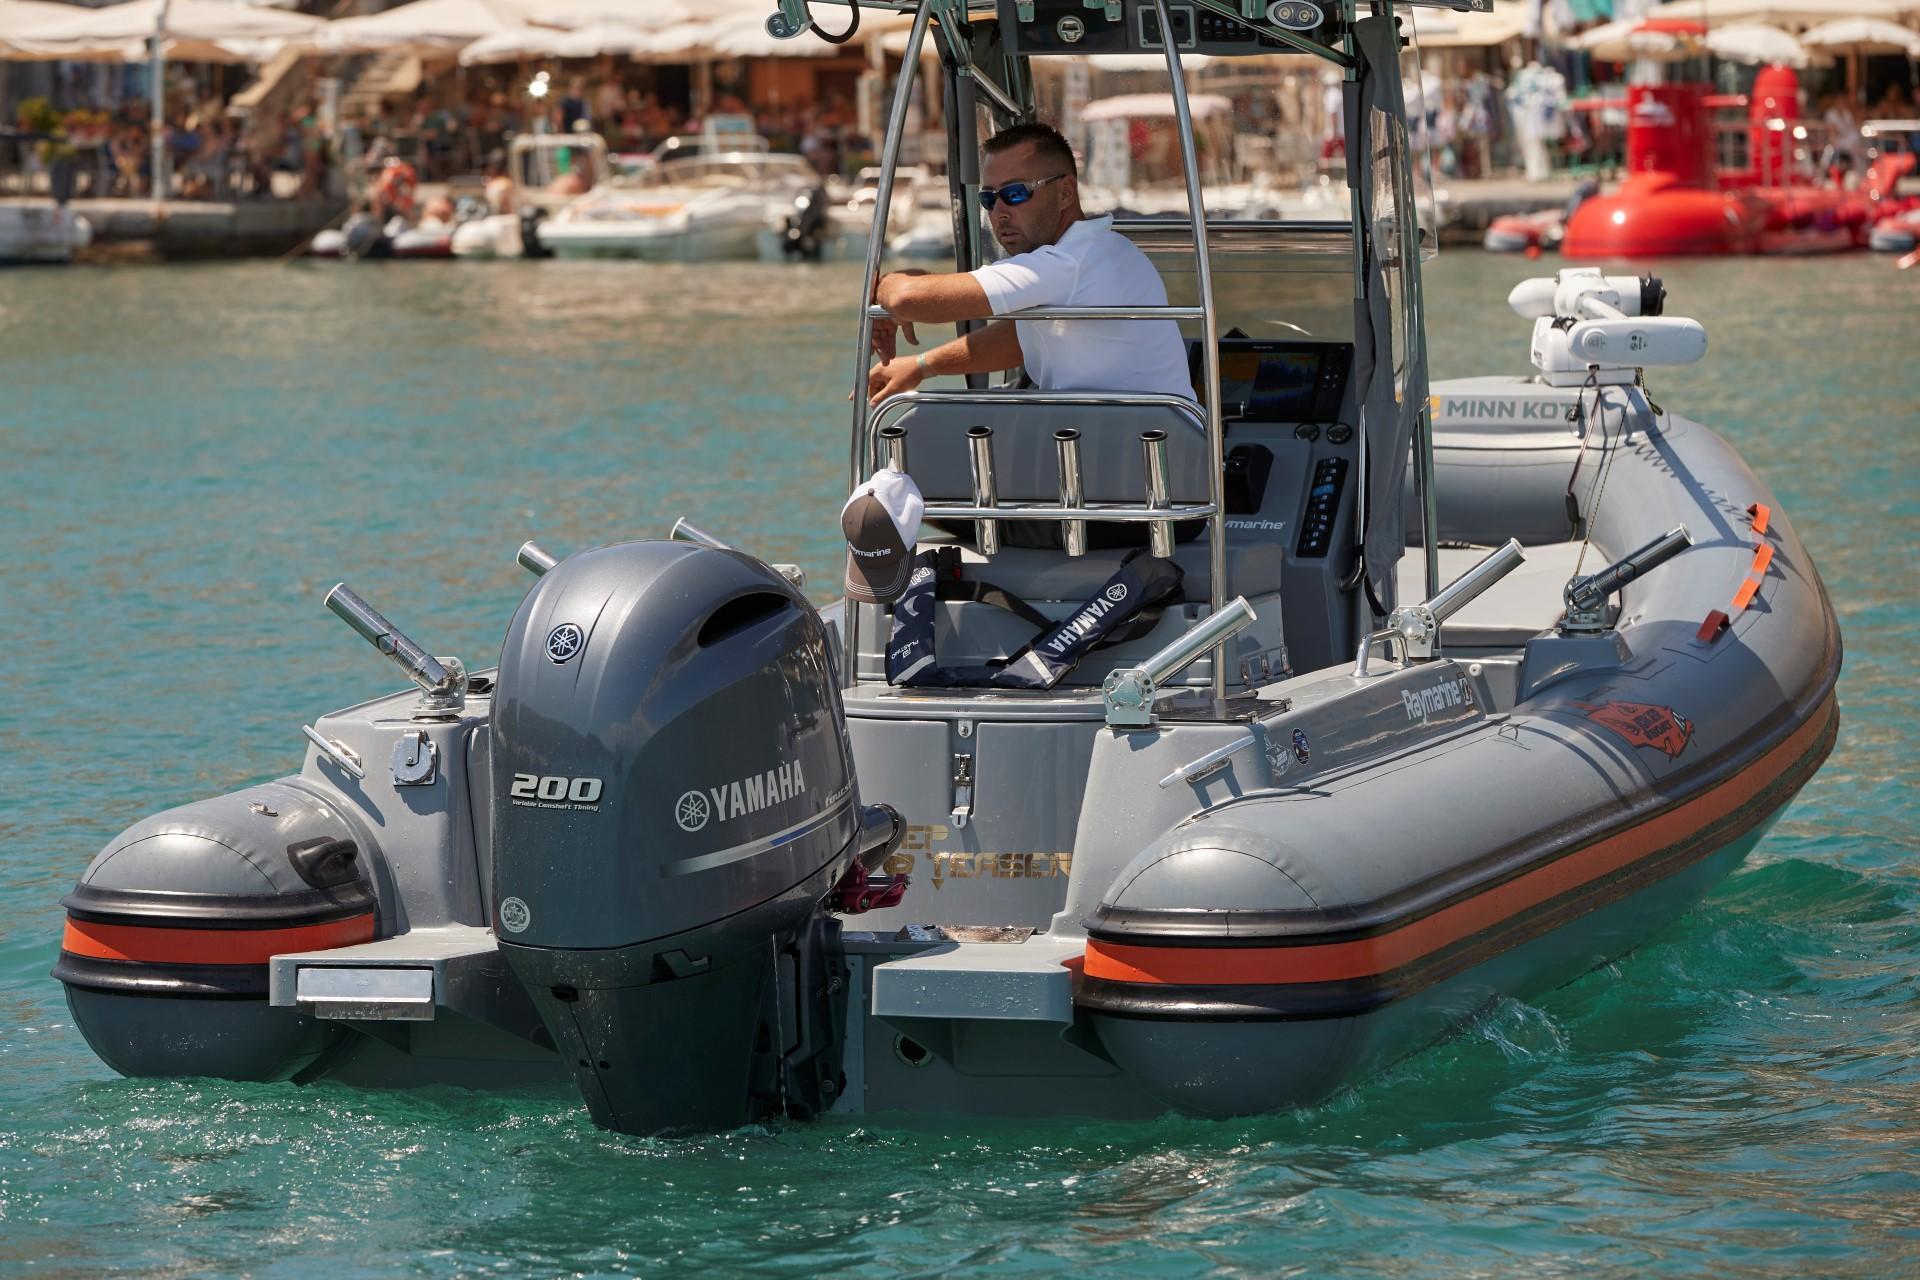 Joker Boat Barracuda aft